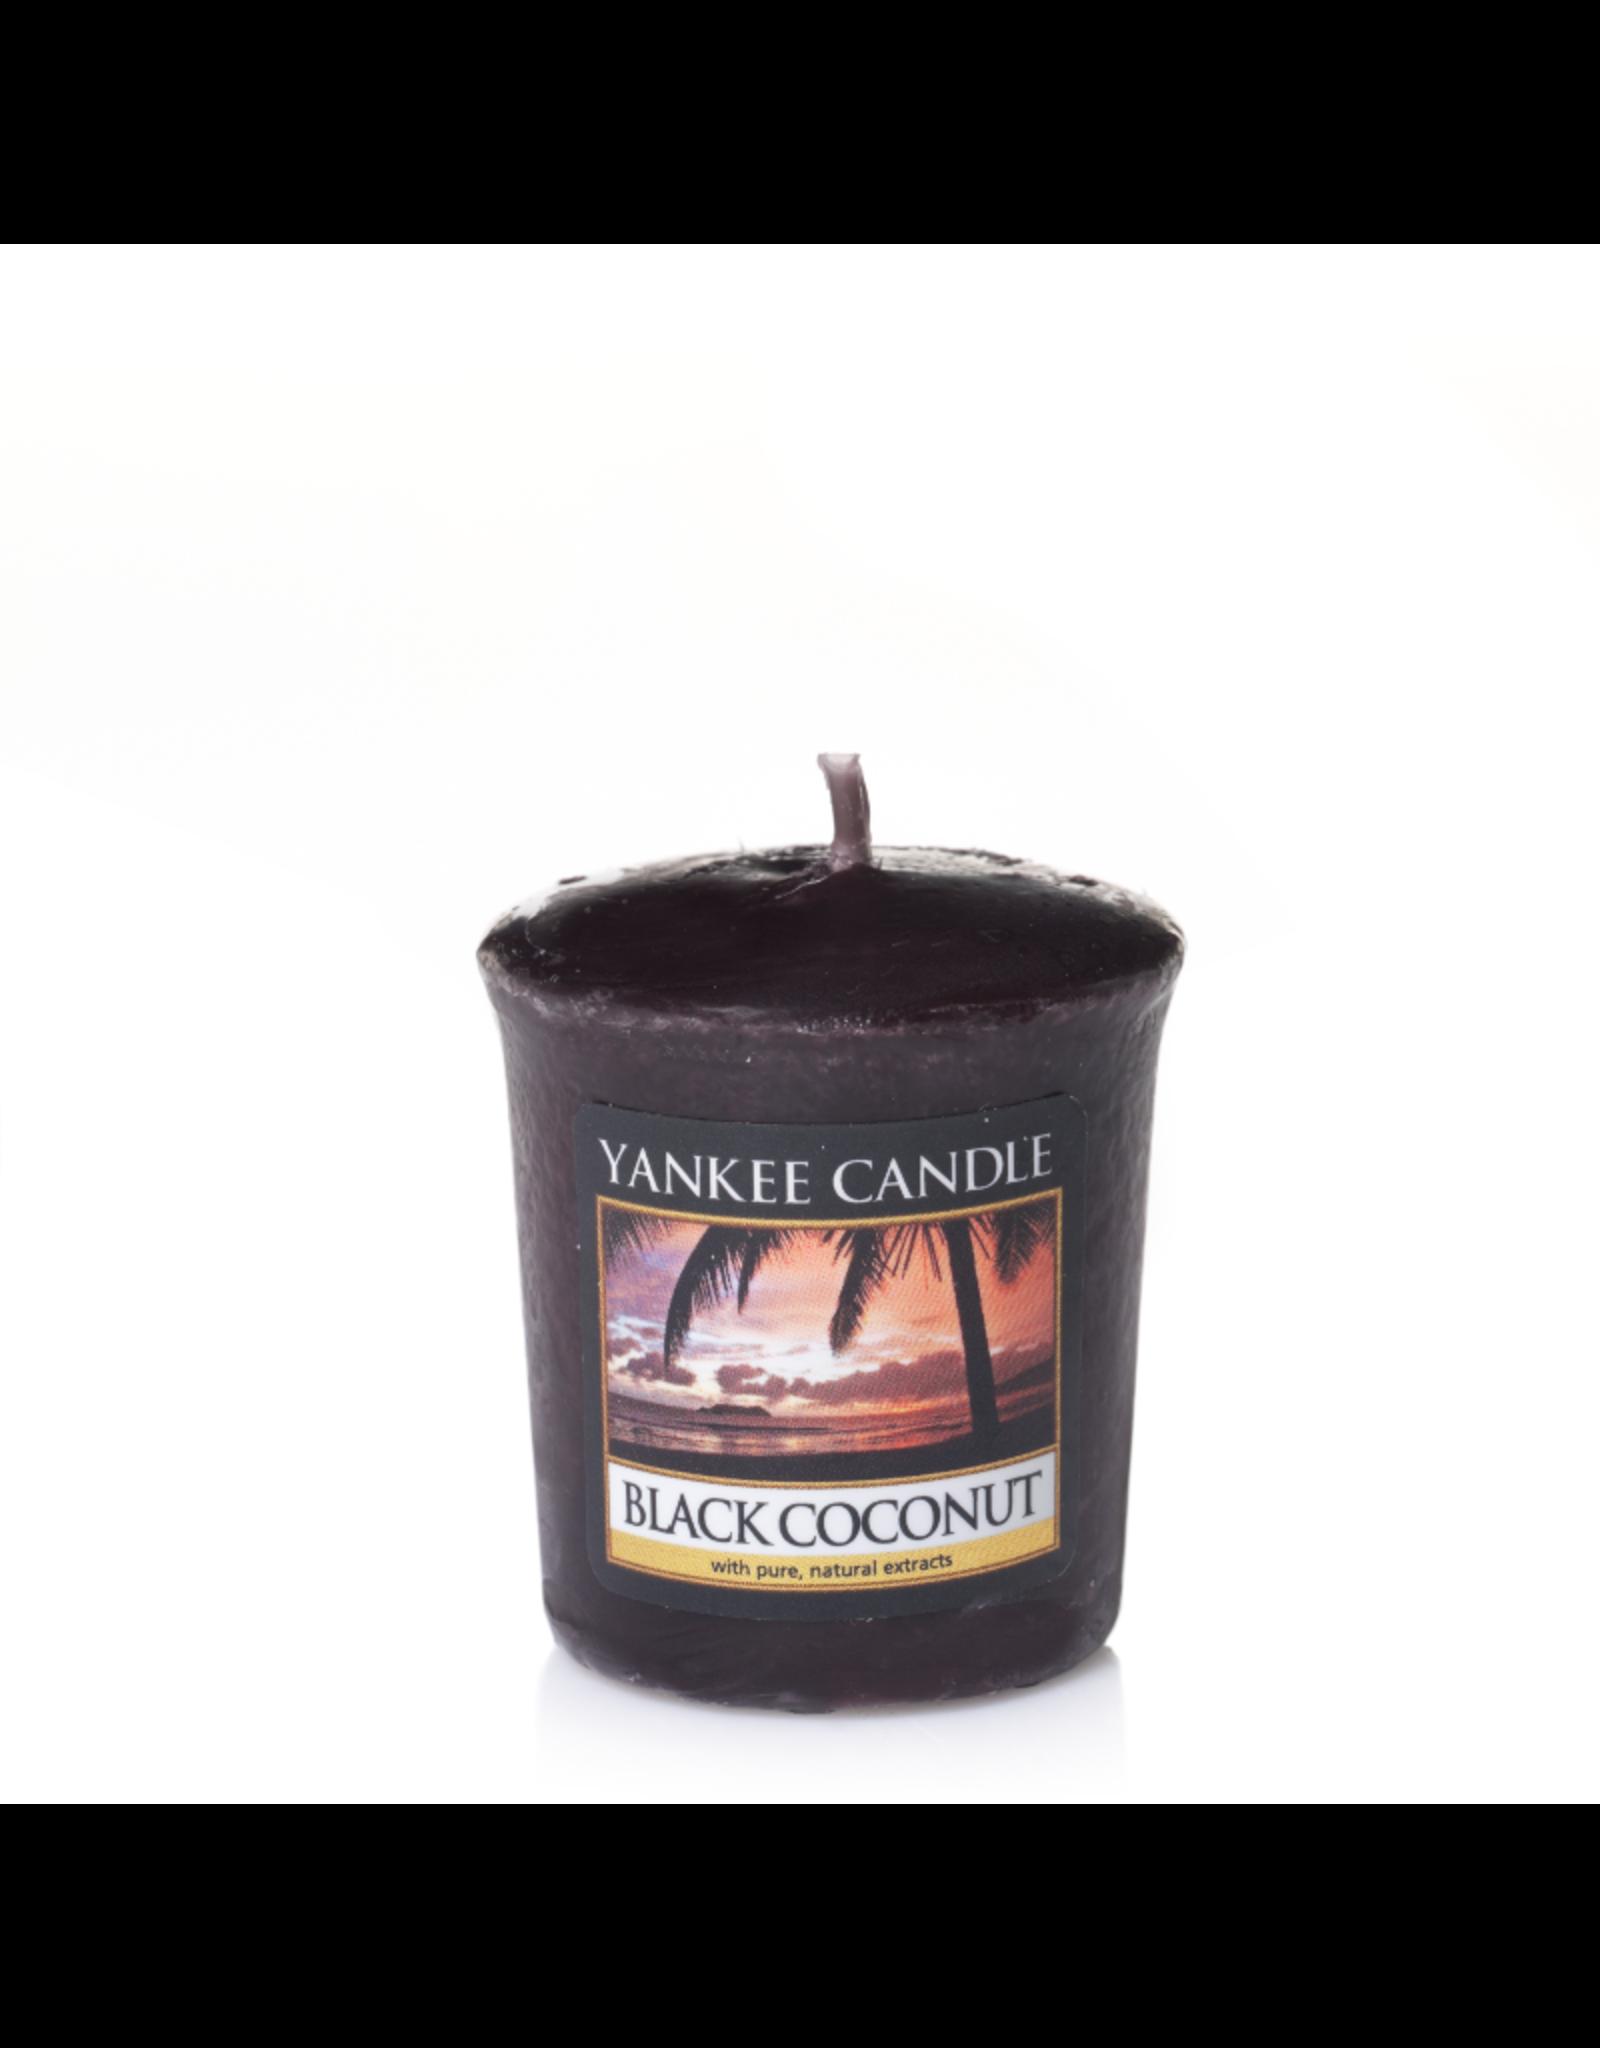 Yankee Candle Black Coconut Votive